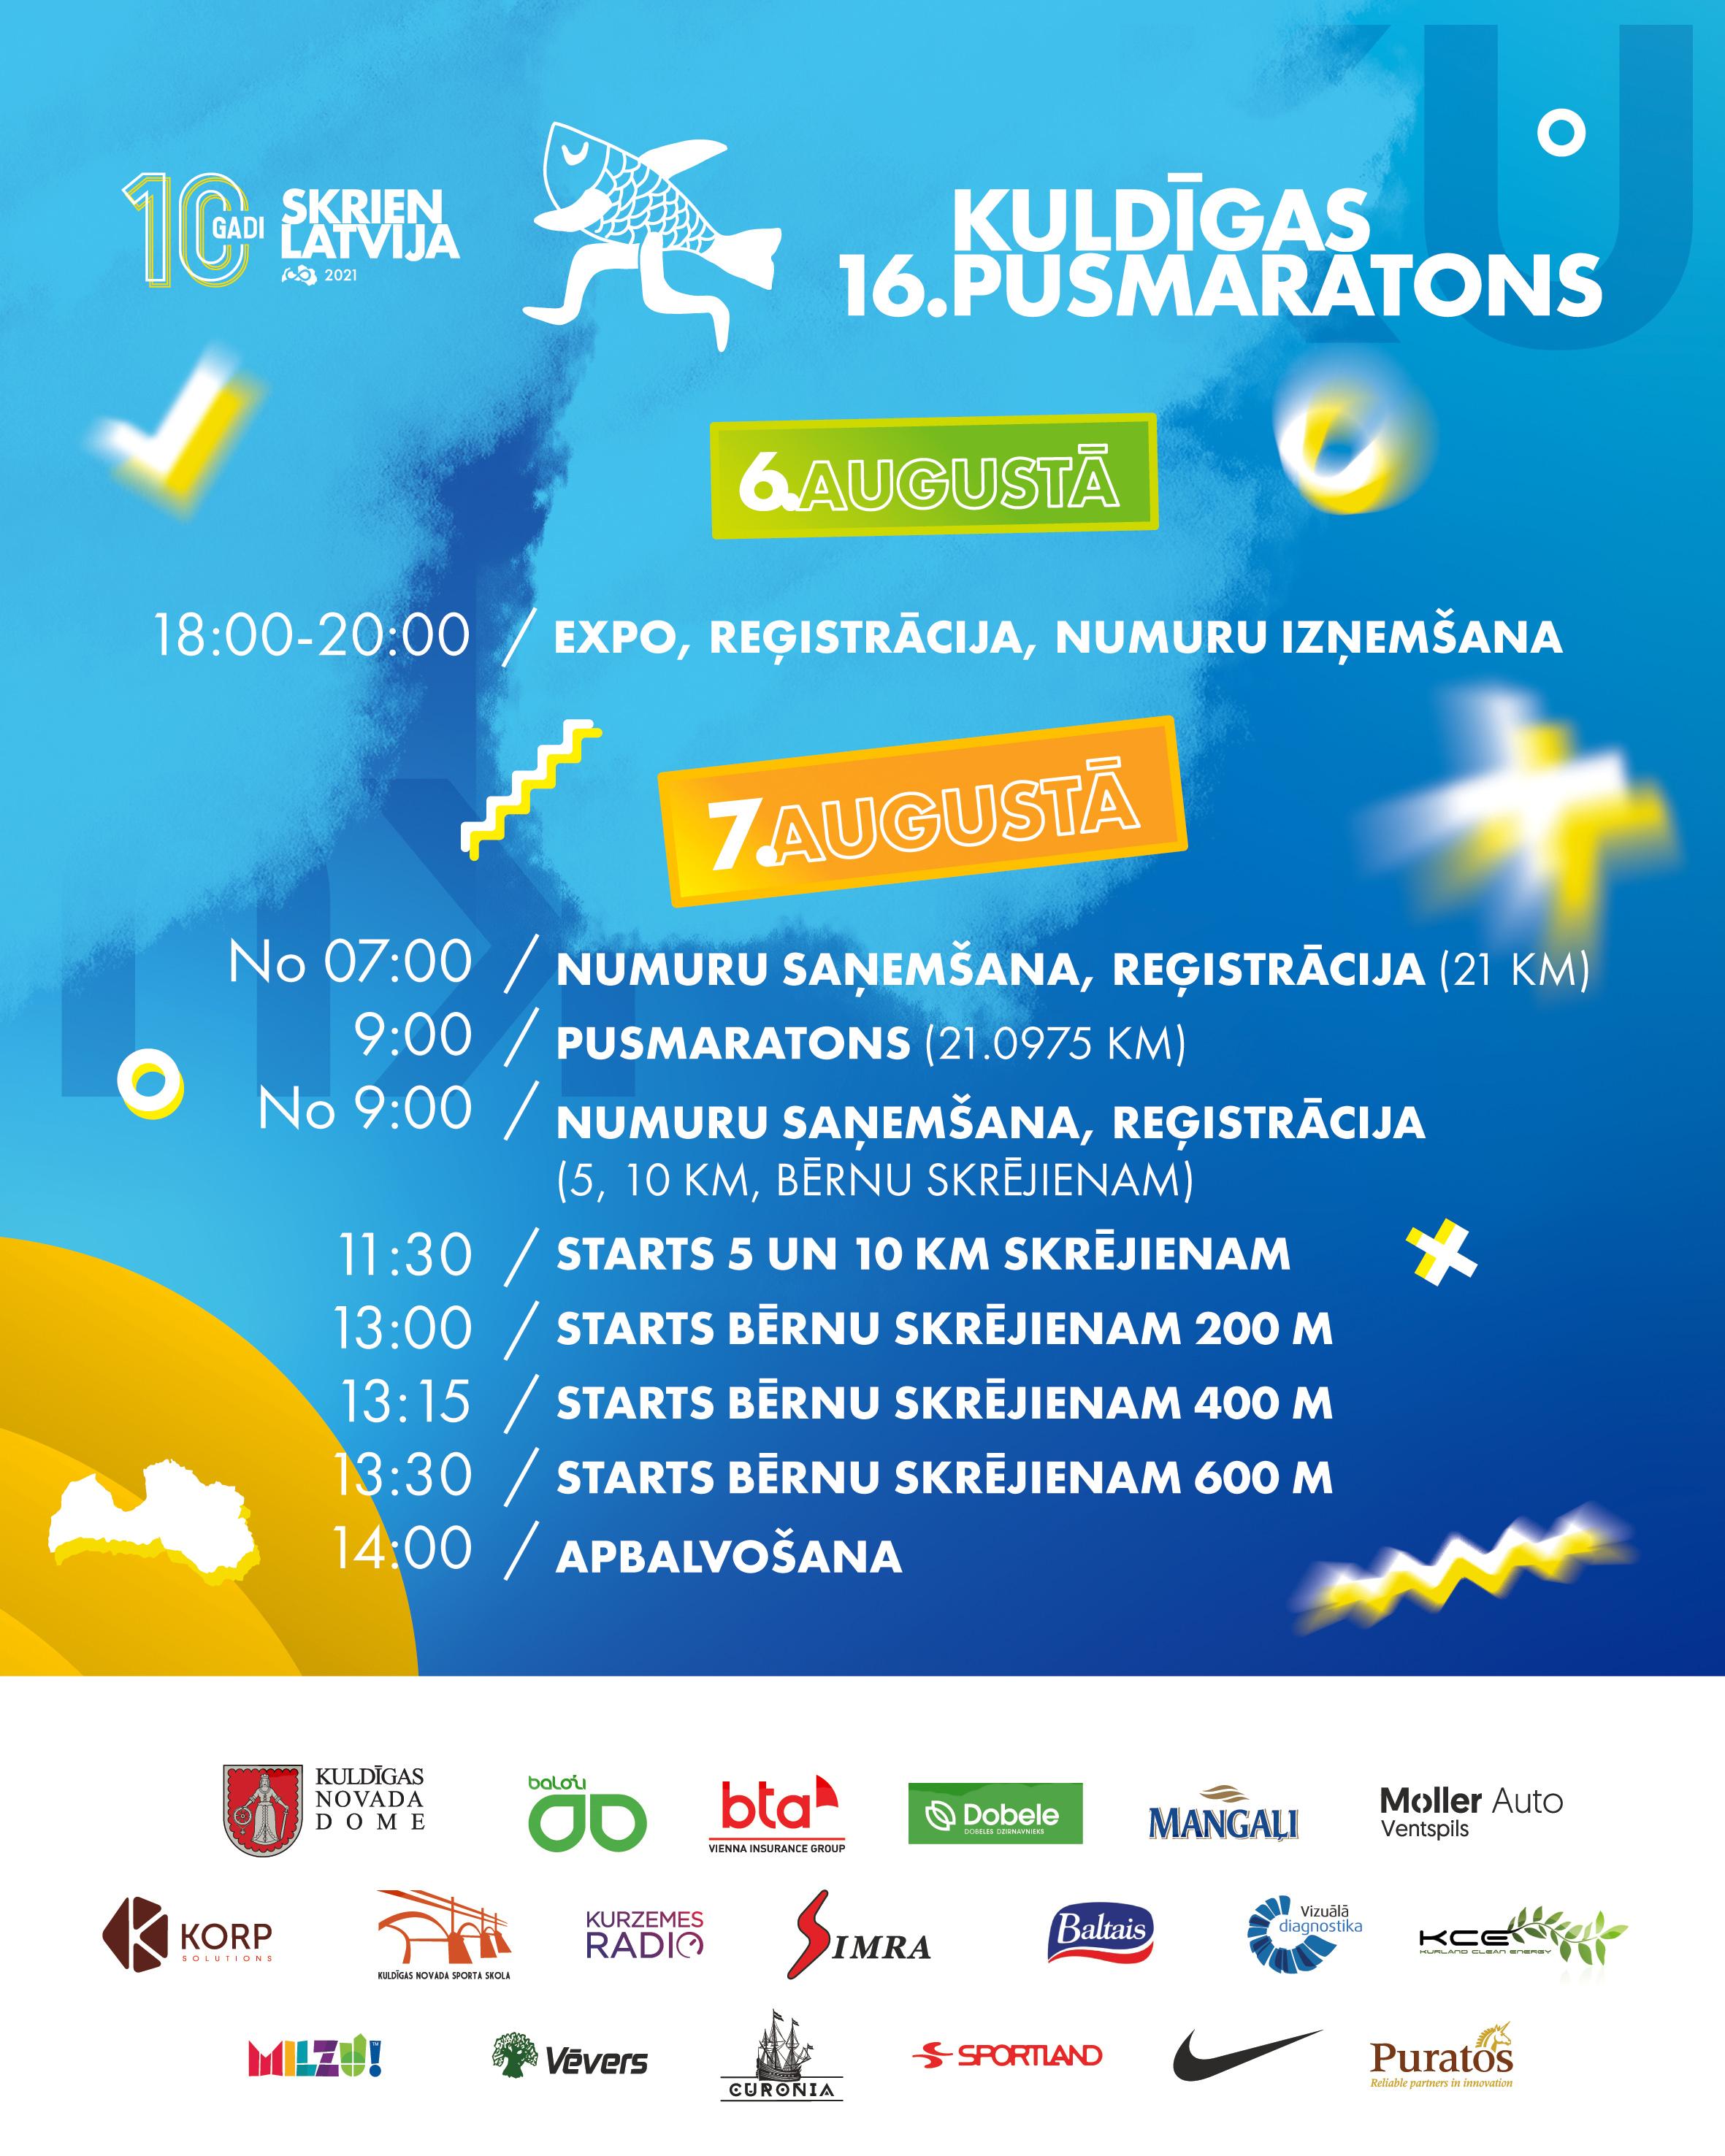 16. Kuldīgas pusmaratona programma